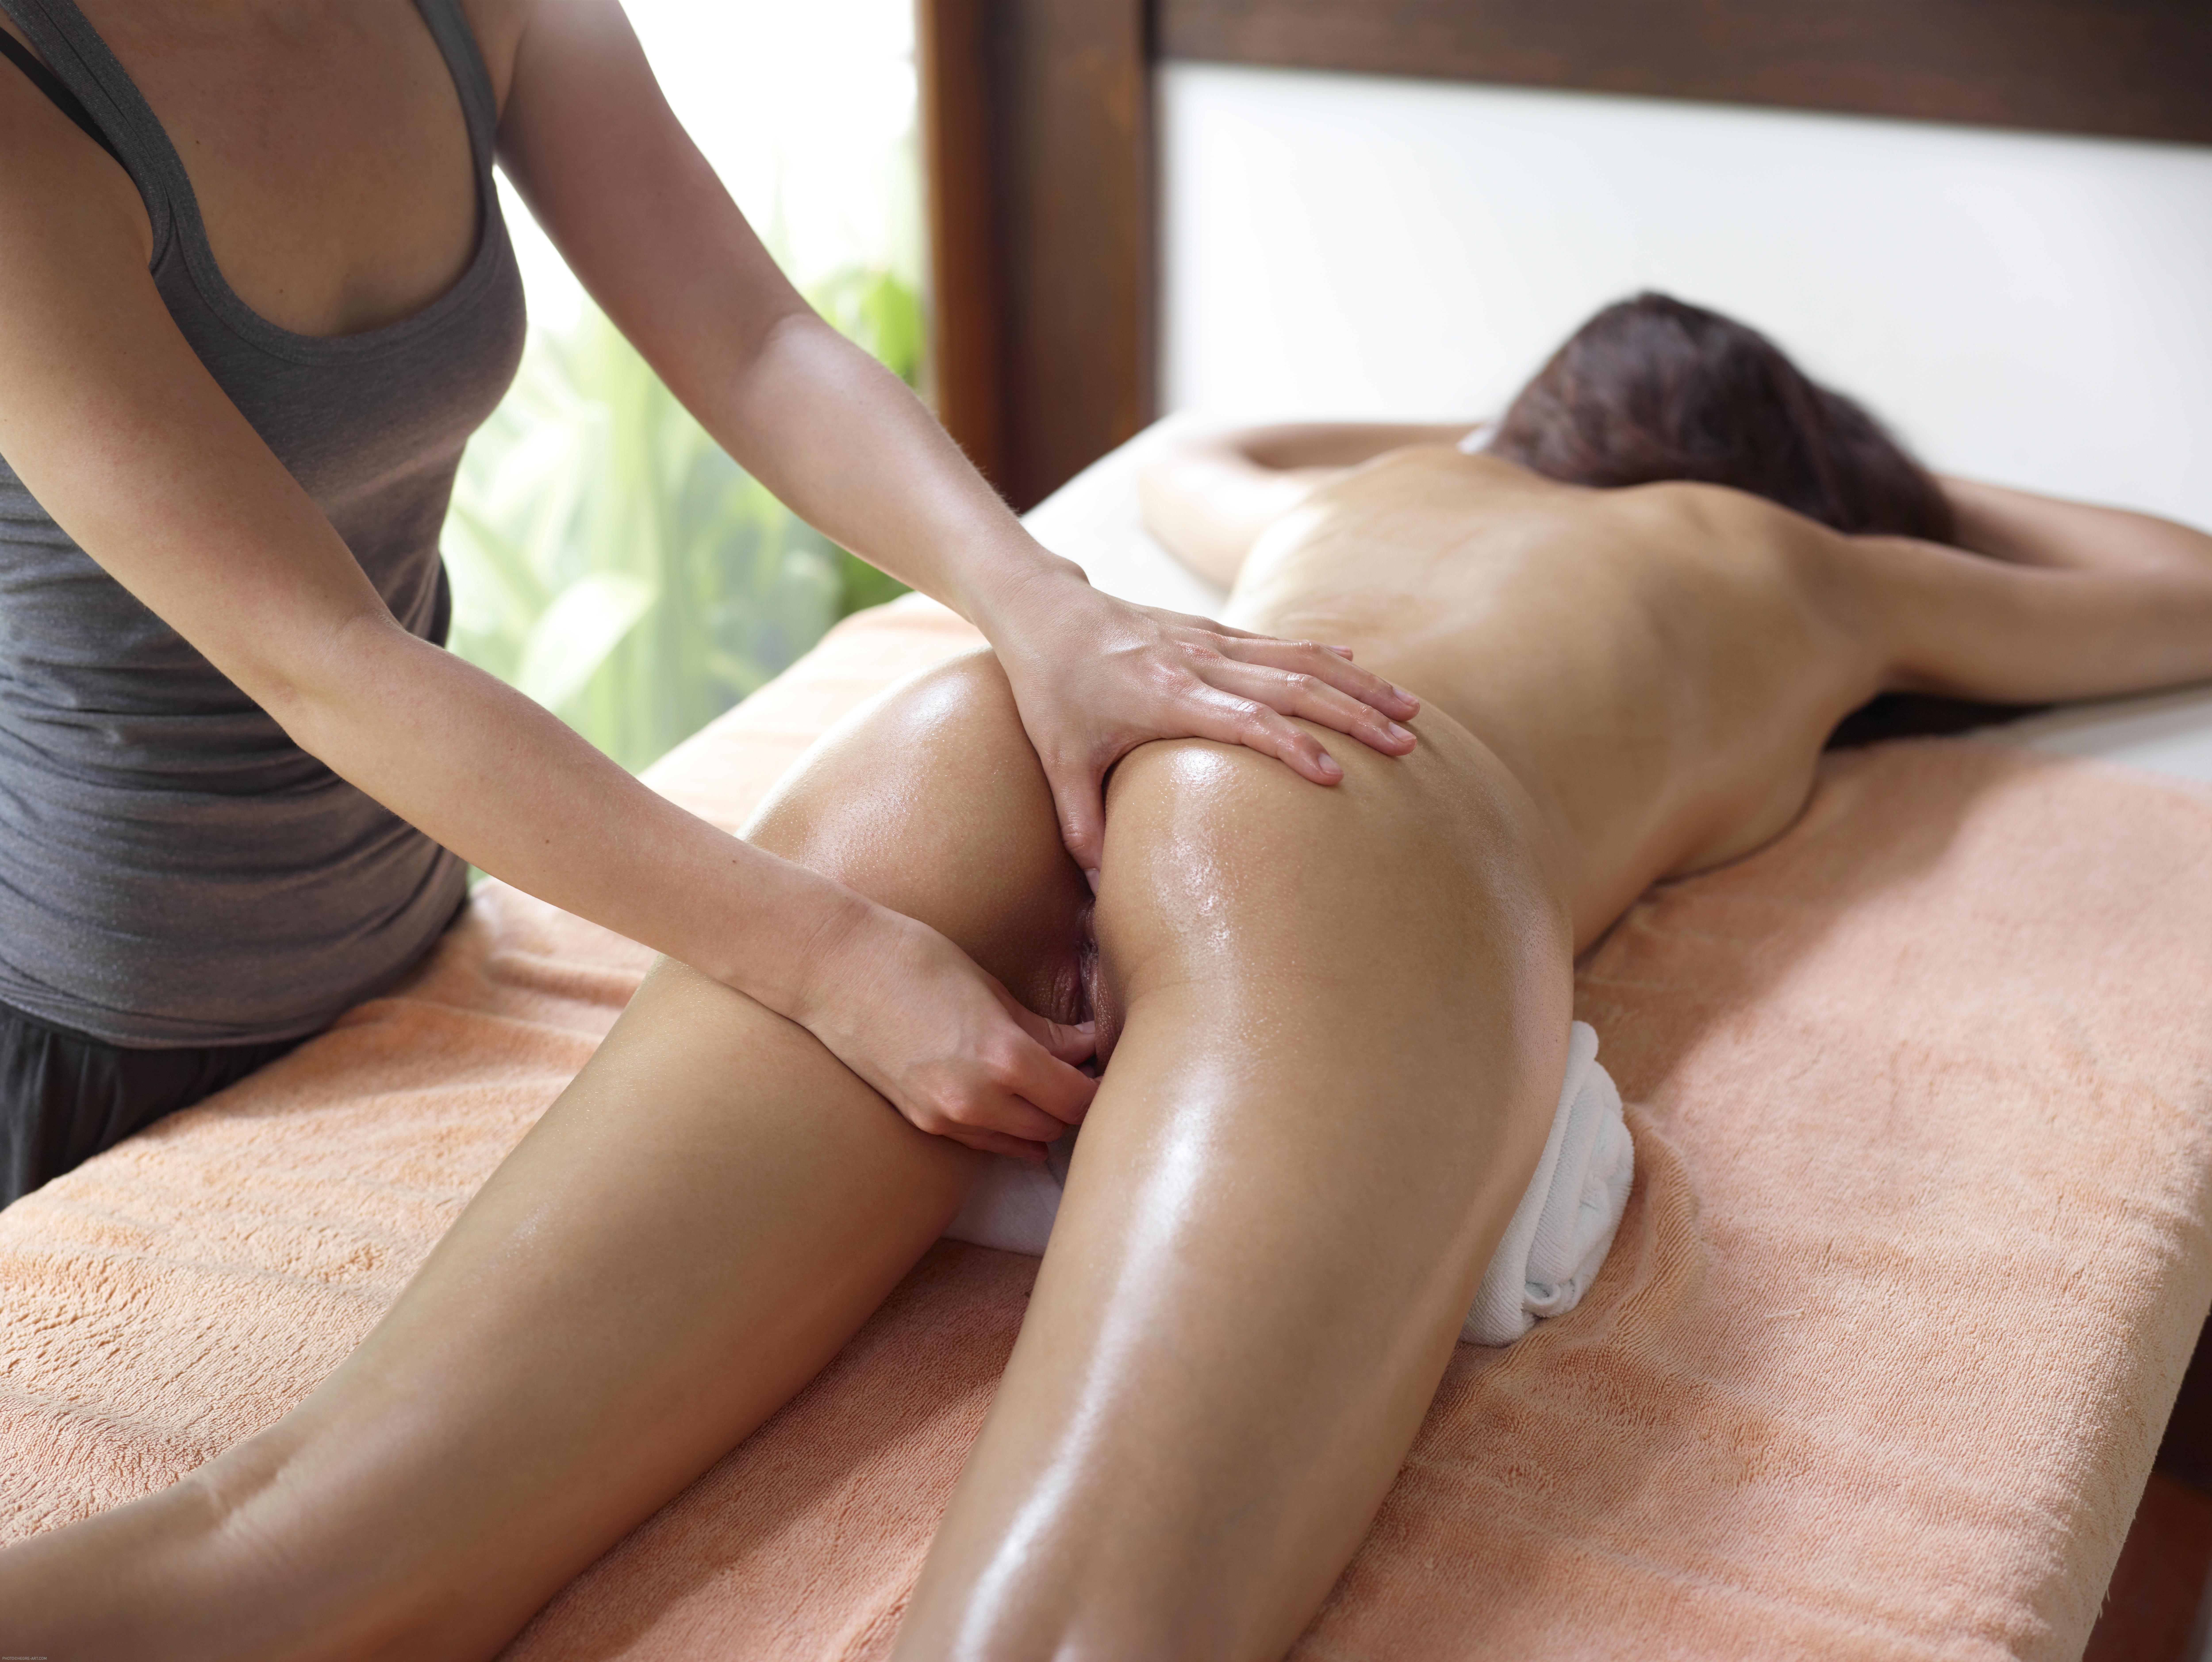 erotische massage kerkrade leiden erotic massage